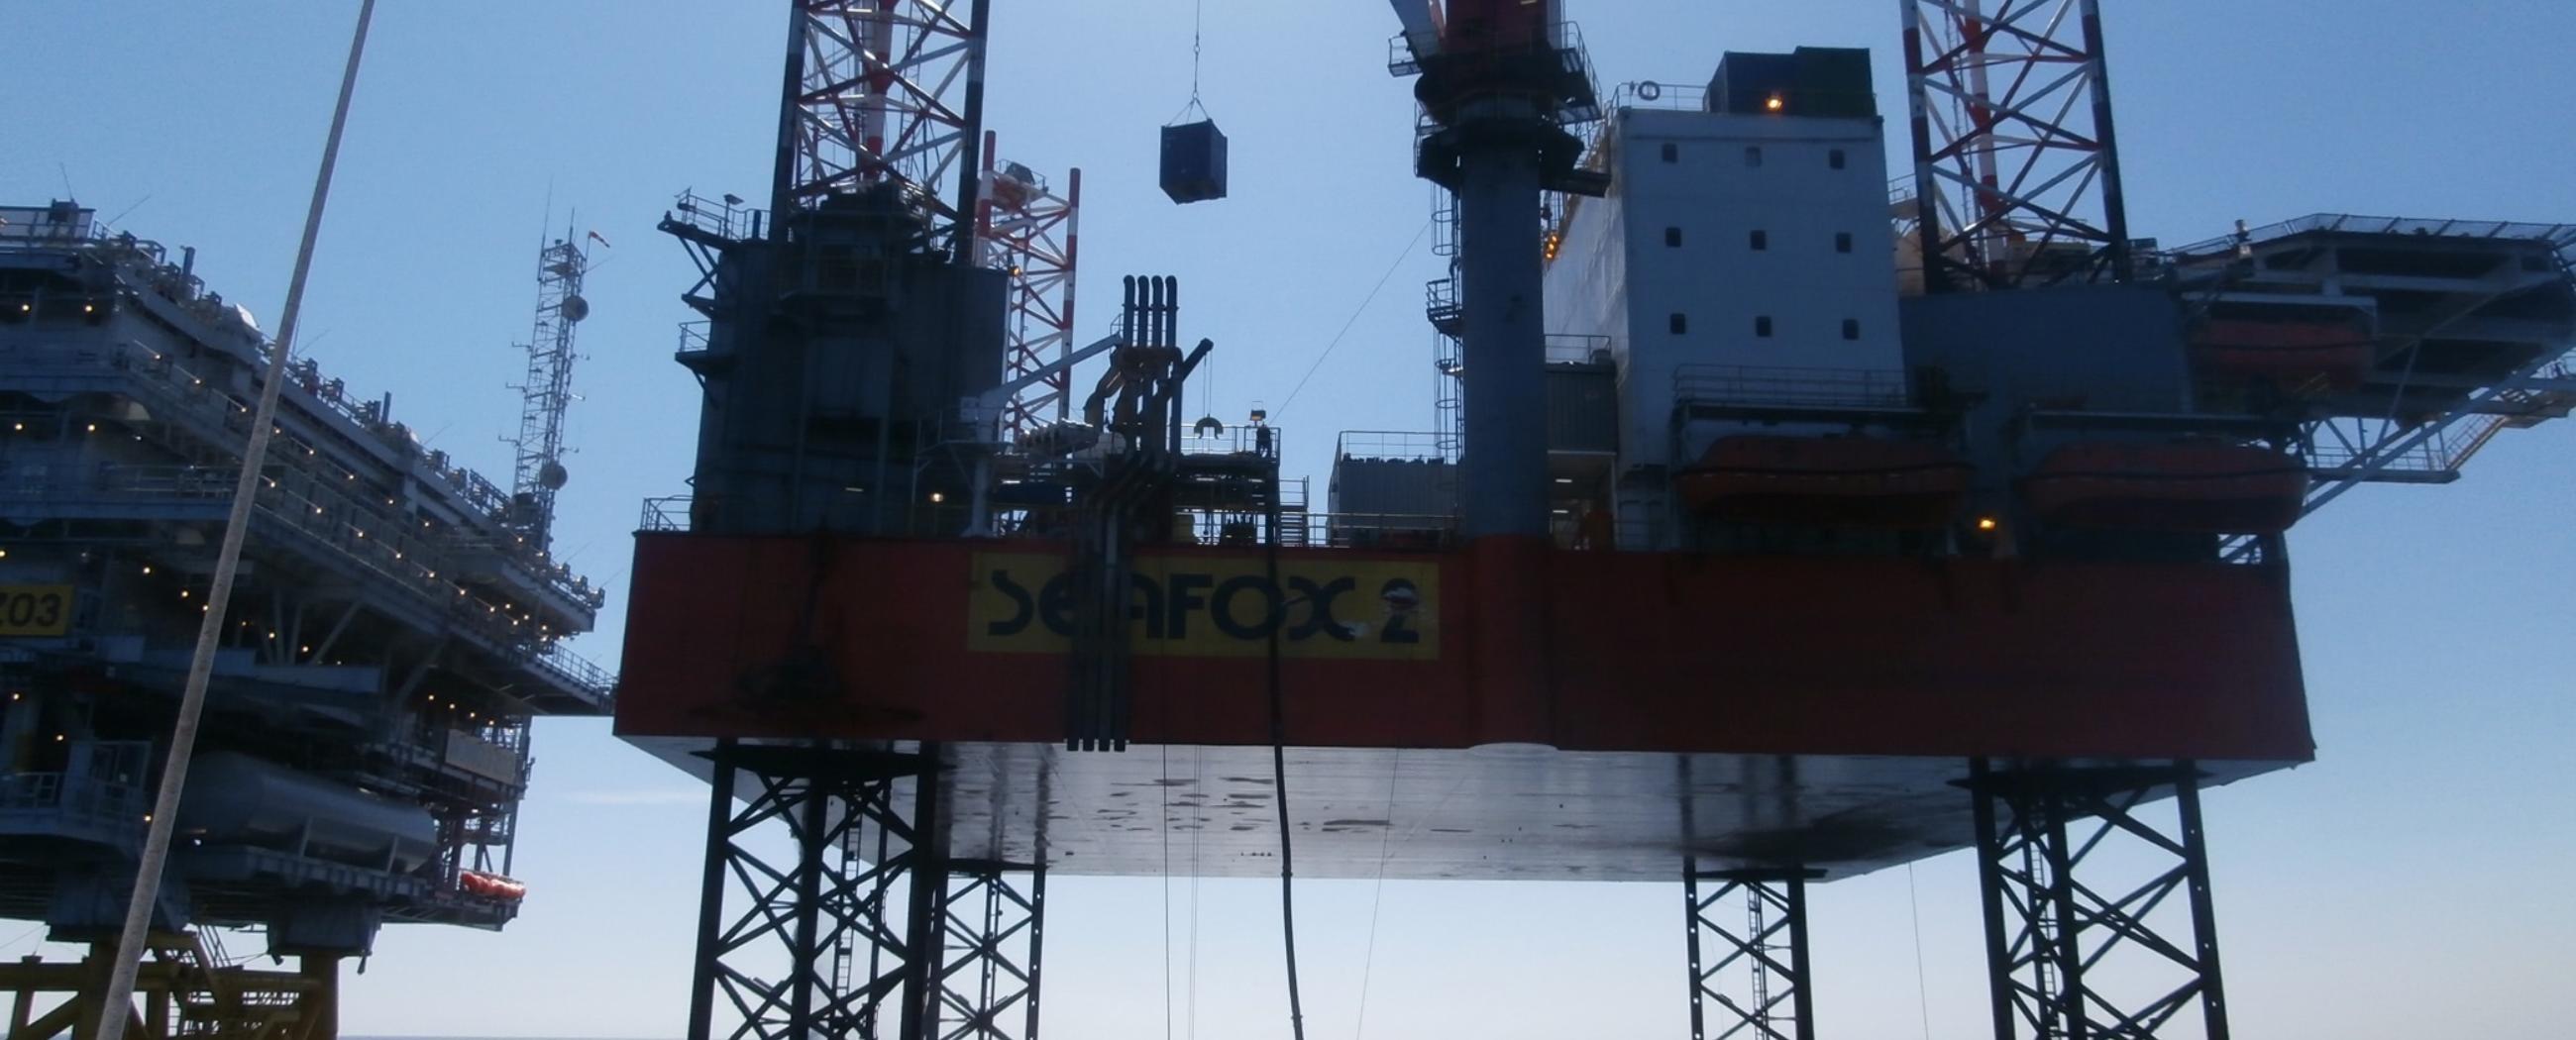 ALP-Ace_Seafox-2_Northsea-towage.JPG